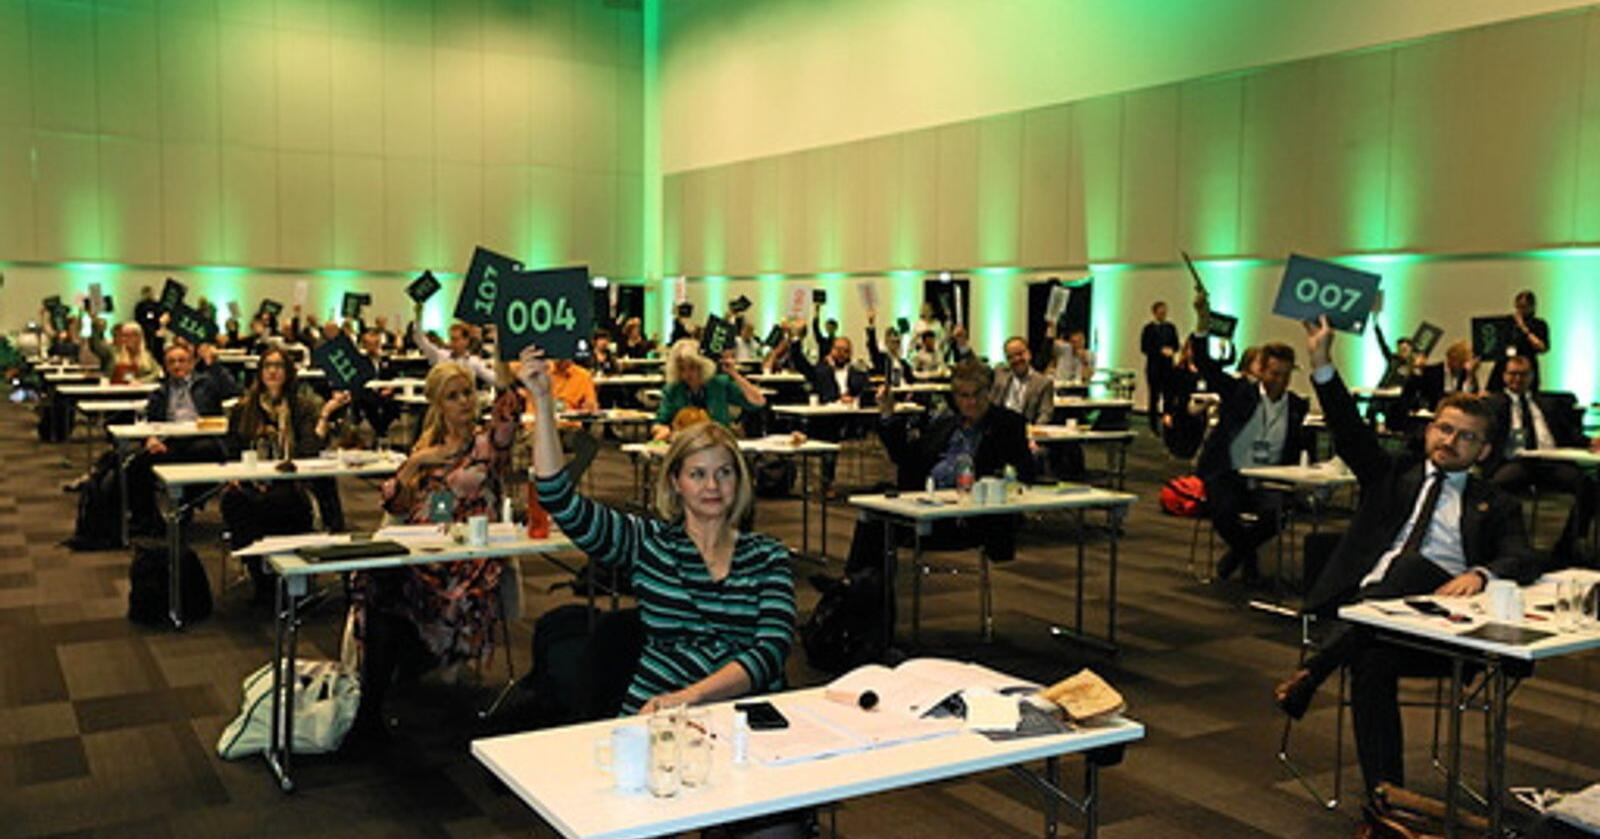 Landsmøte Venstre 2020. Som første parti i landet som snur i EU-saken, sier Venstre nå ja til EU. Foto: Geir Olsen / NTB